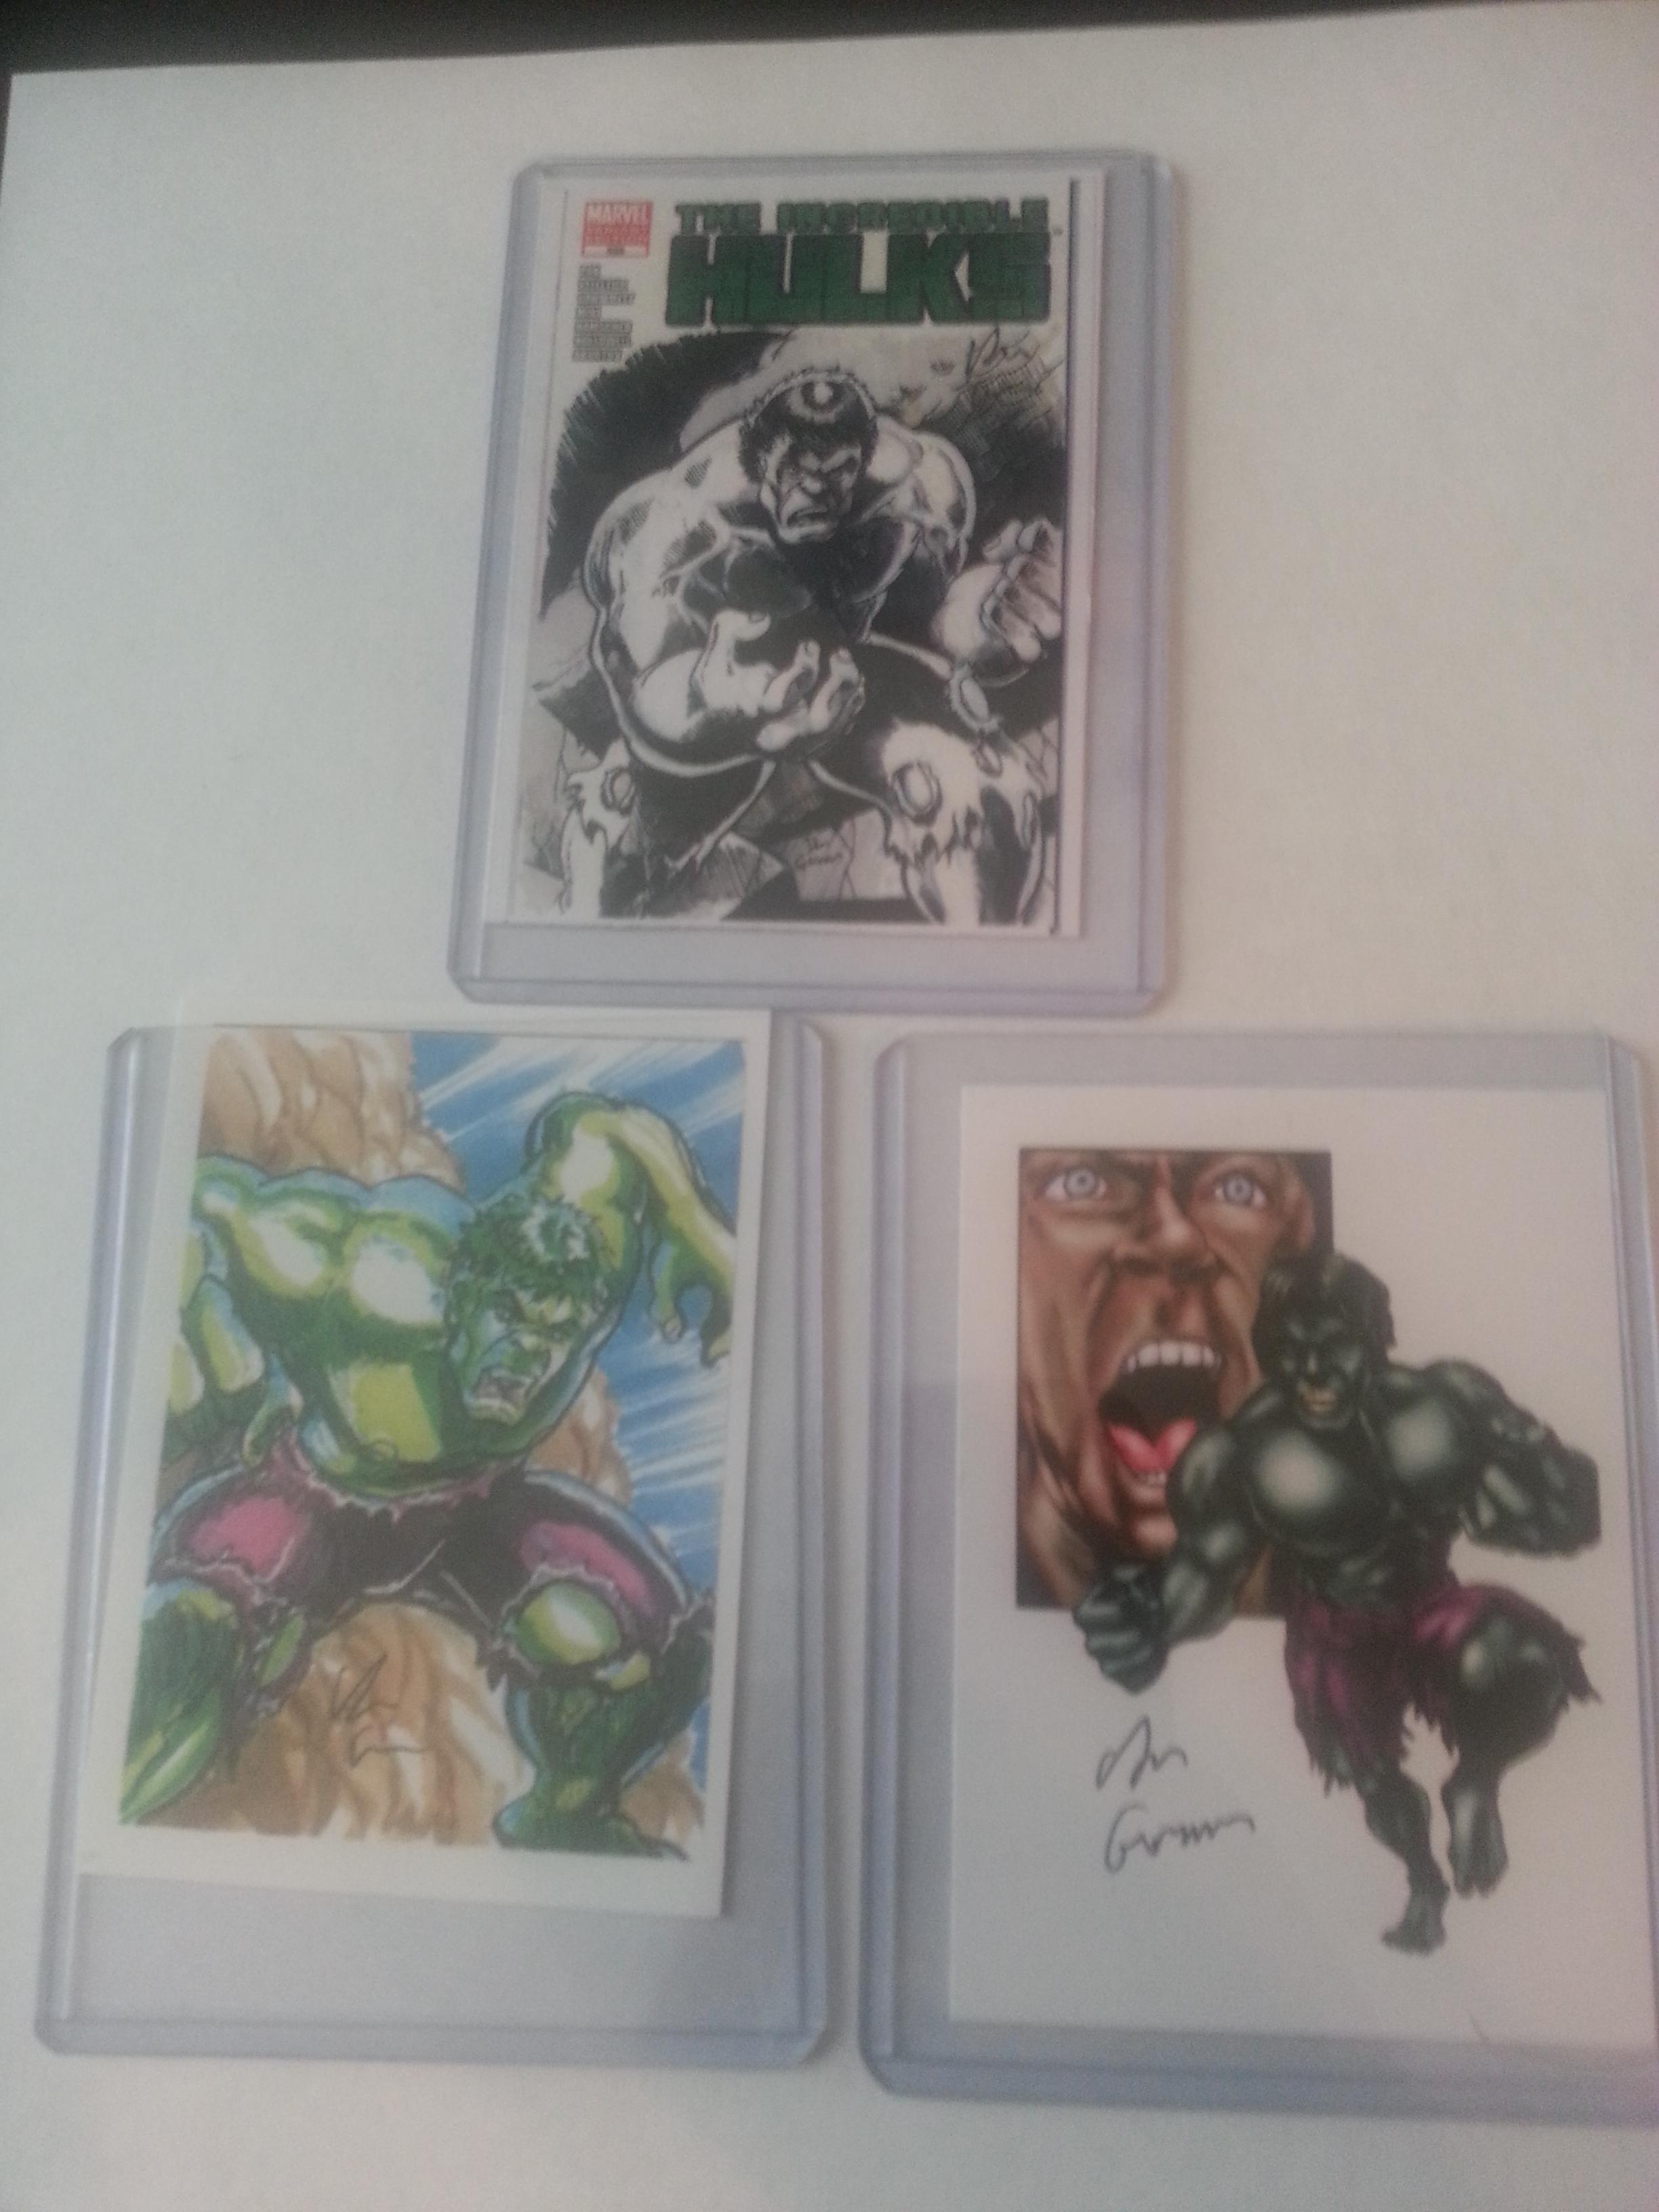 Dan Gorman's sketch cards